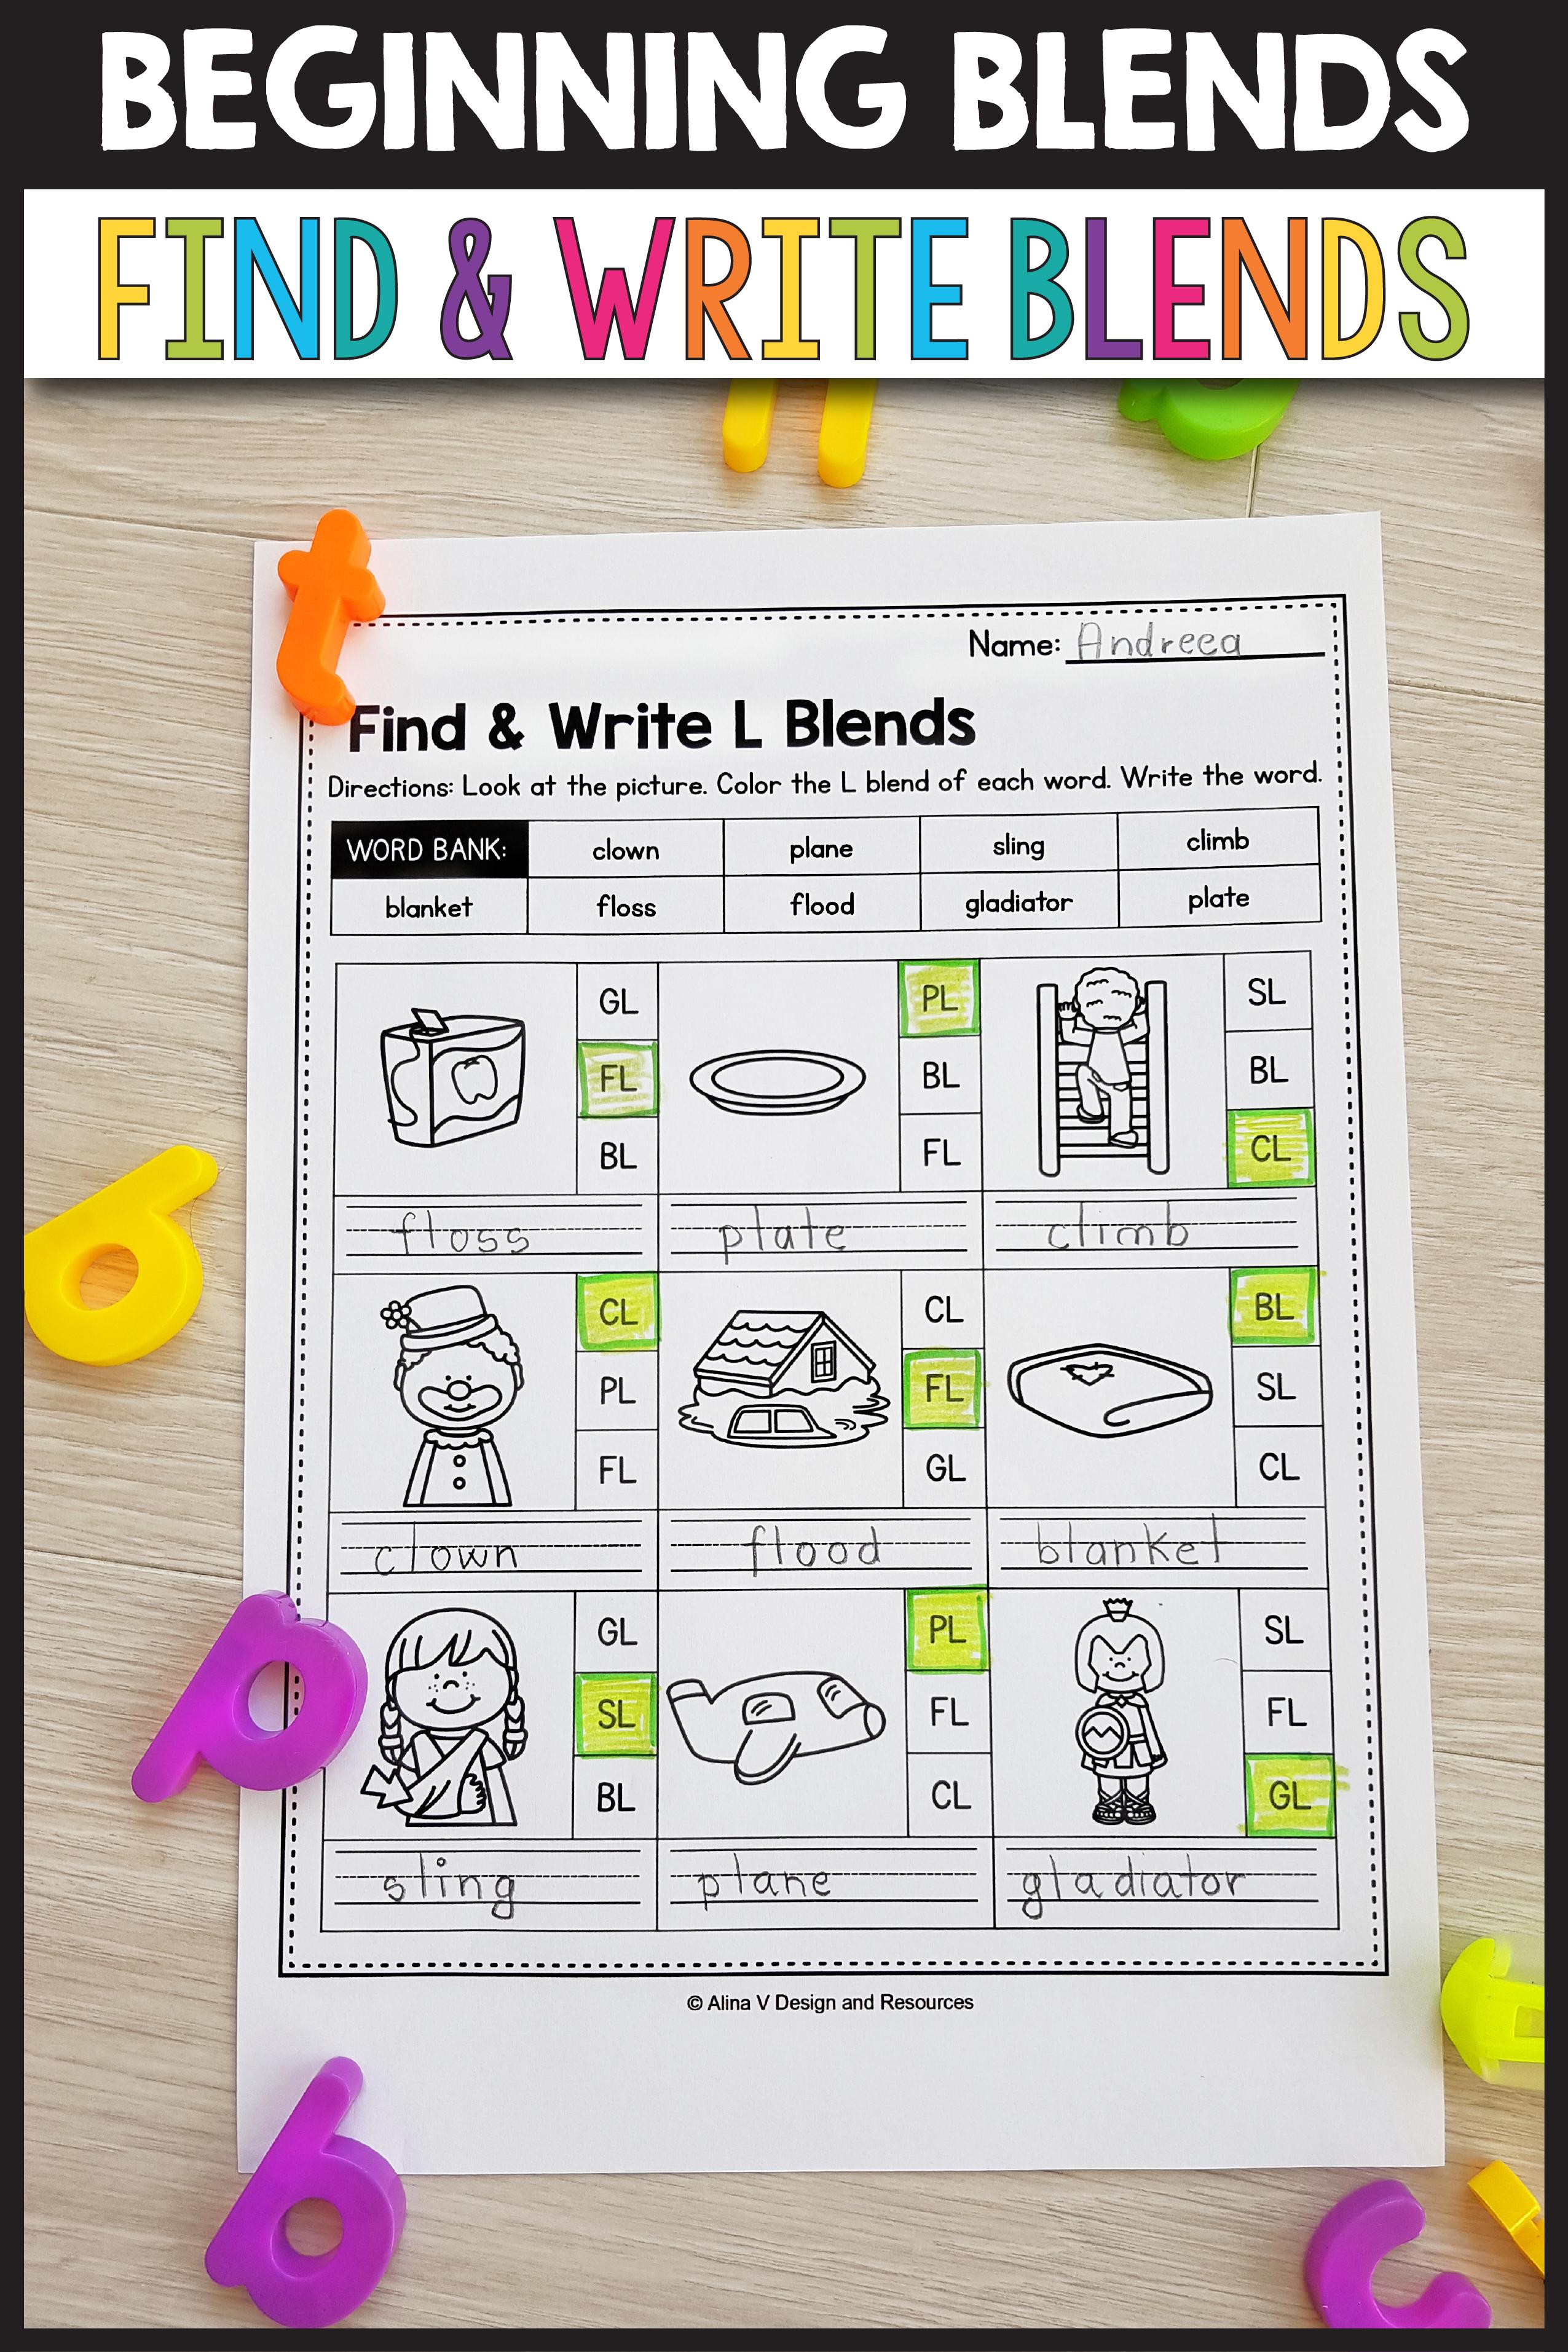 S Blends Worksheets L Blends Activities